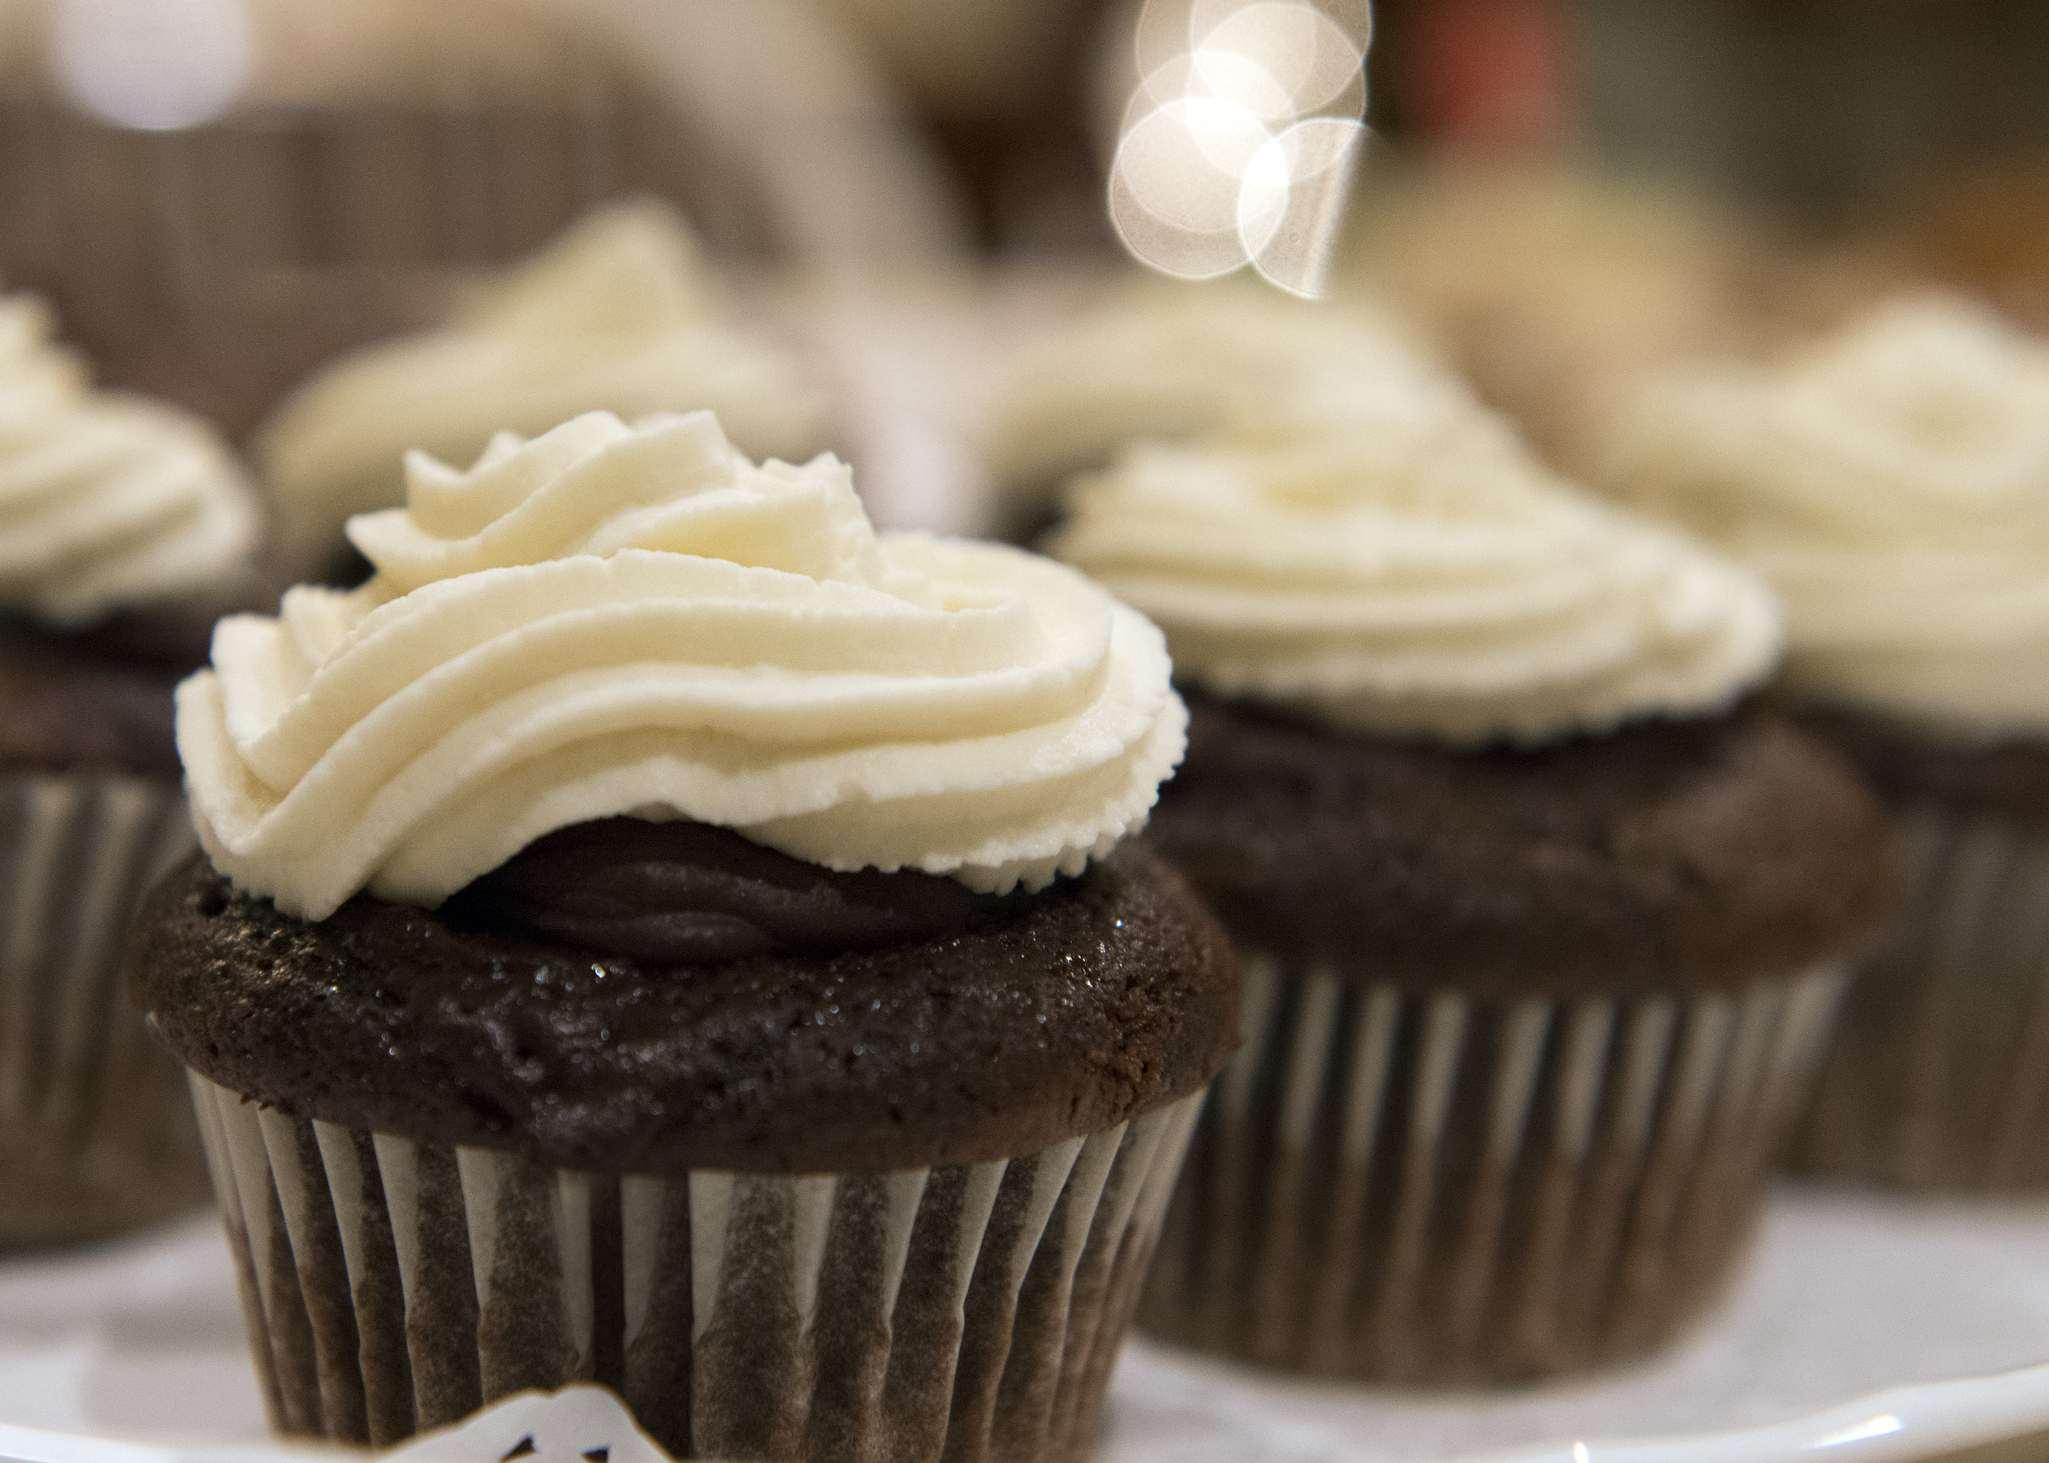 Gluten-free chocolate cupcakes